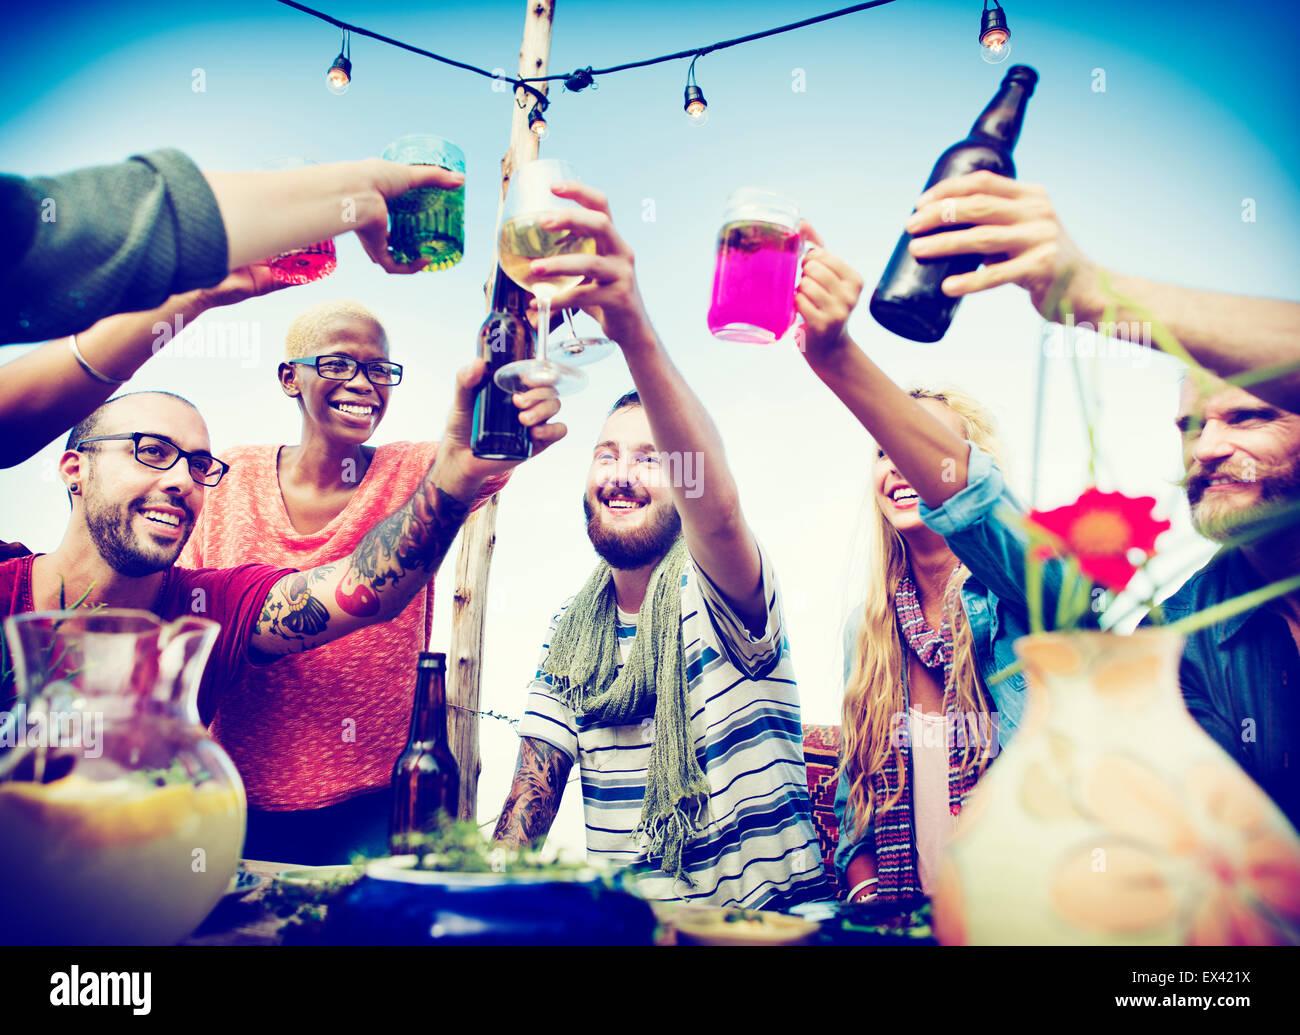 Beach Cheers Celebration Friendship Summer Fun Dinner Concept - Stock Image